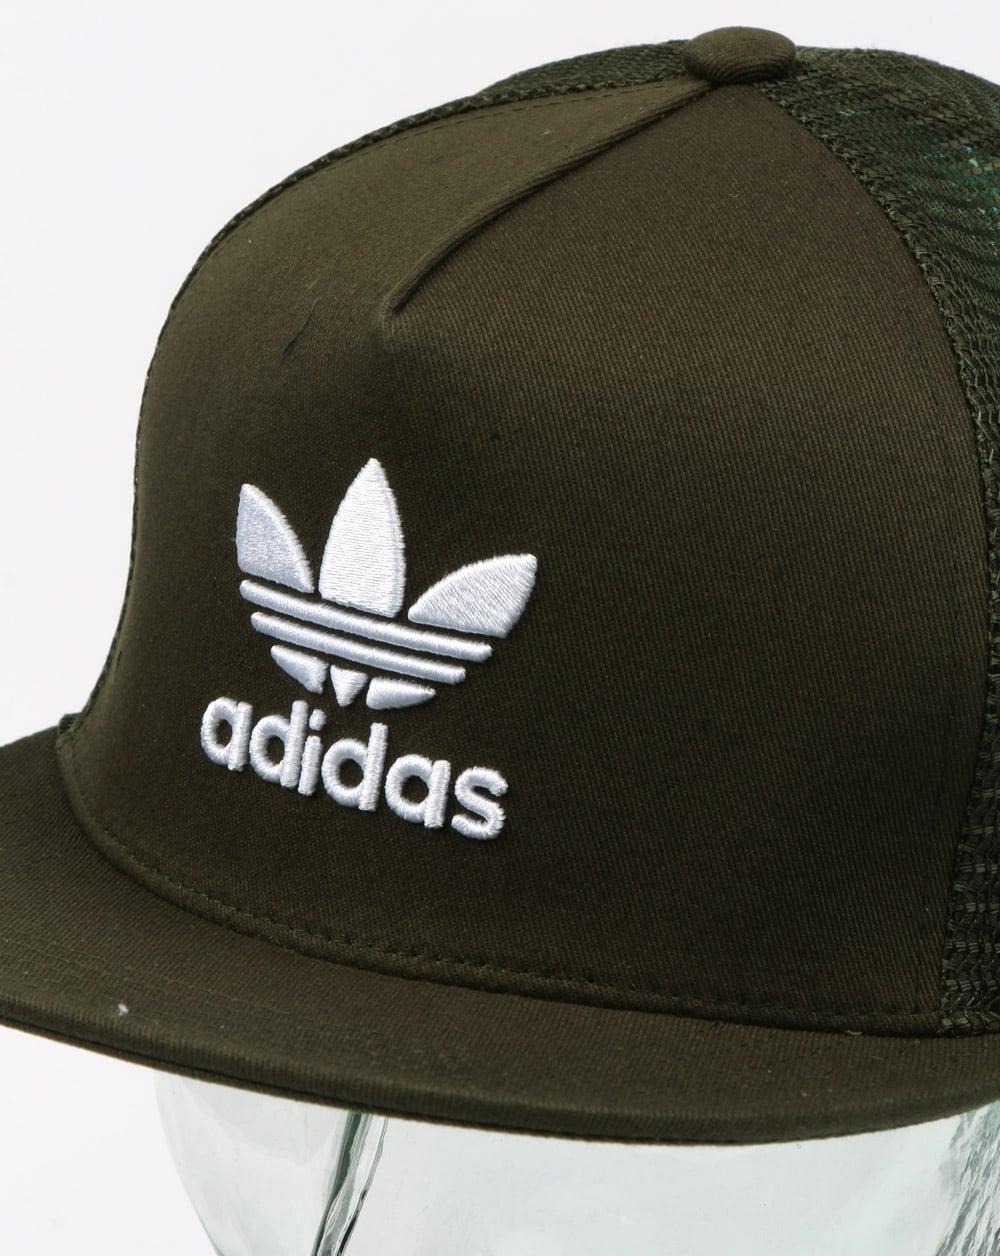 9f6f9bea Adidas Originals Trefoil Trucker Cap Night Cargo, Mens, Hat,Adjustable